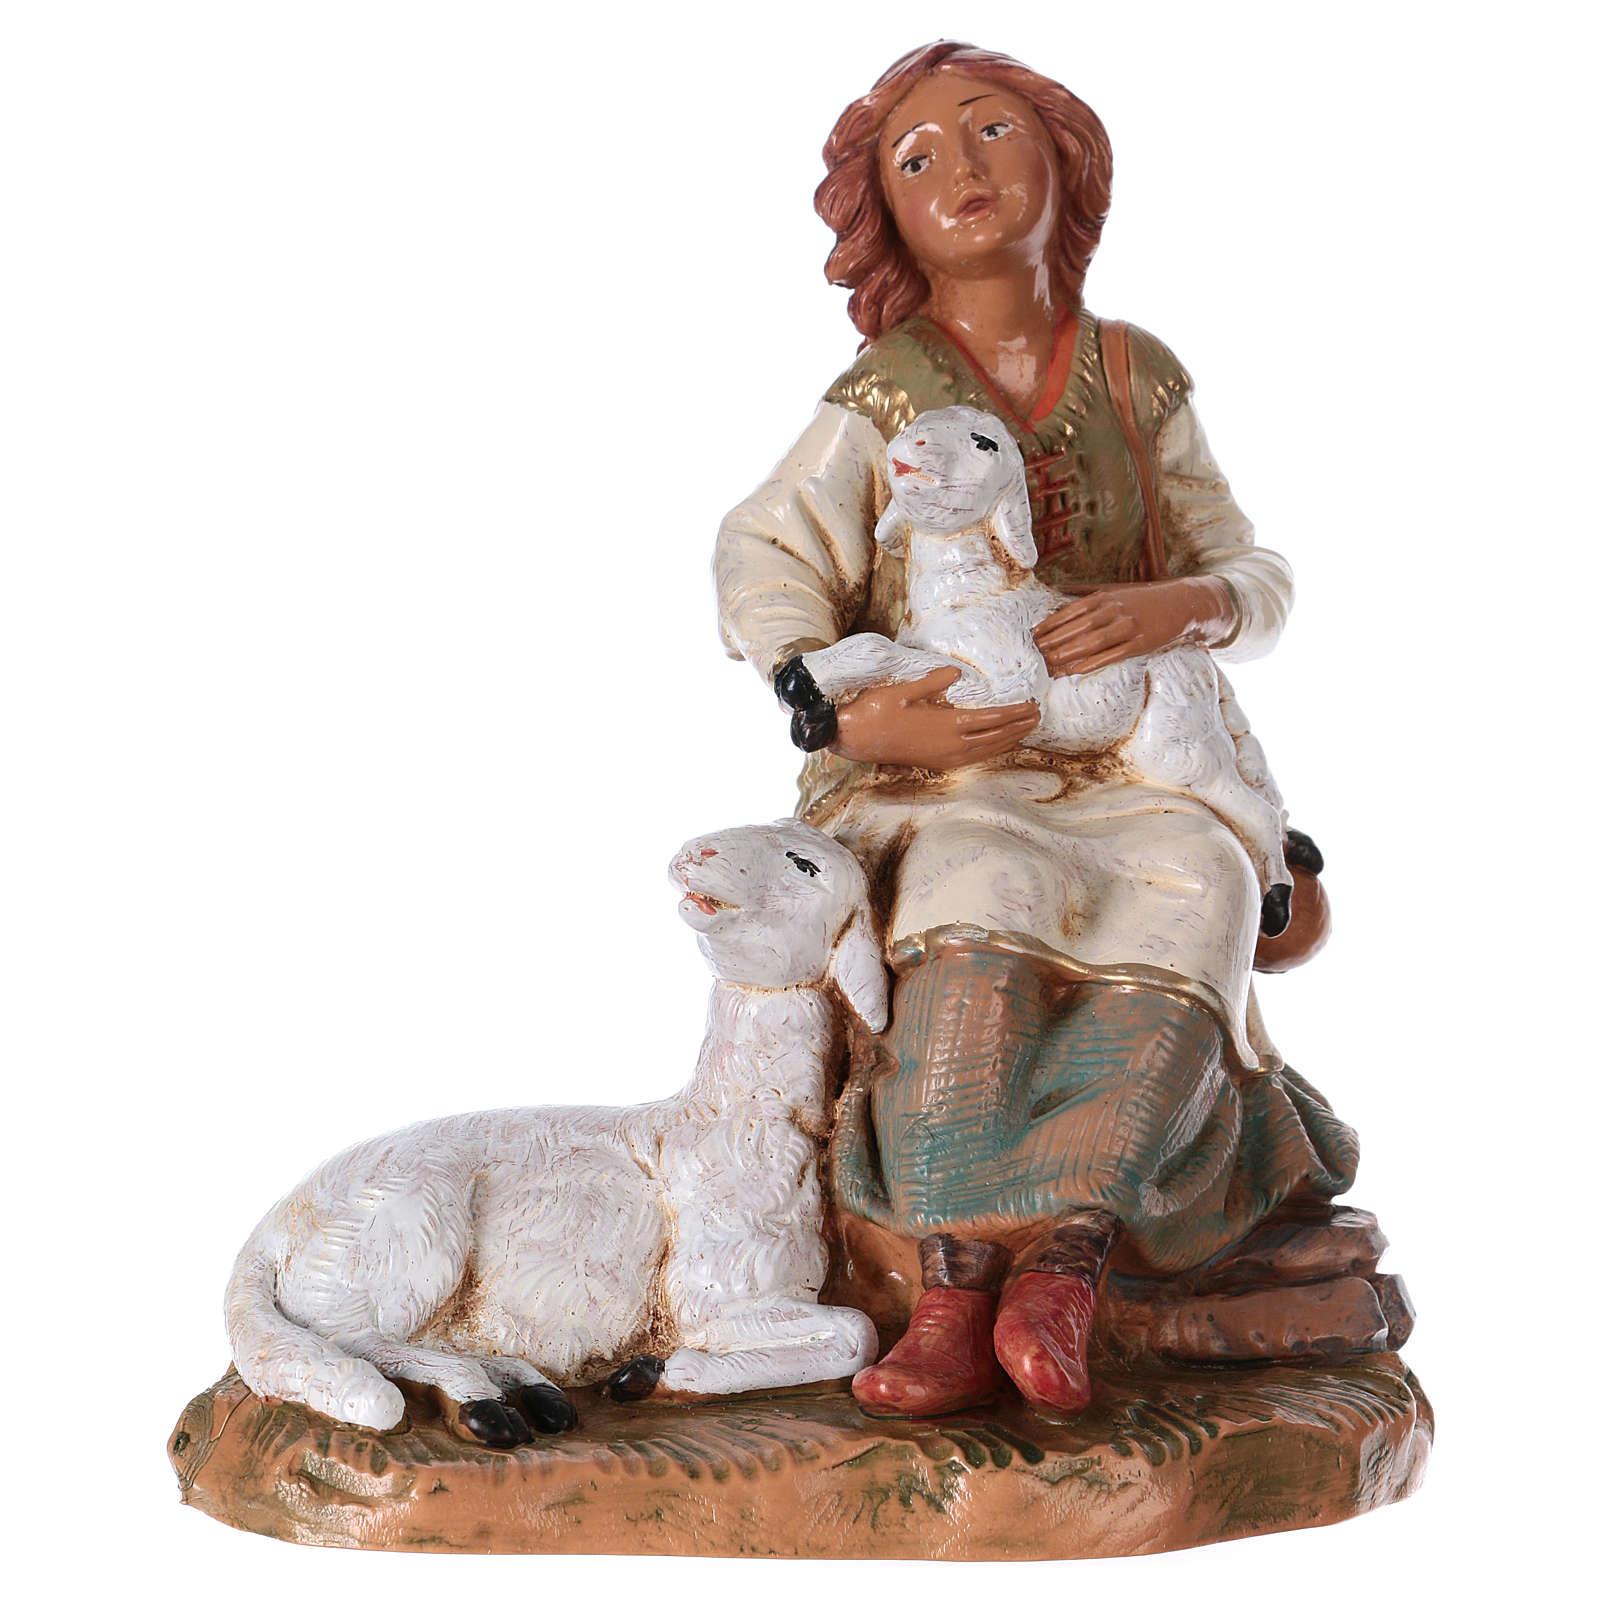 Pastora con ovejas 19 cm de altura media Fontanini 4